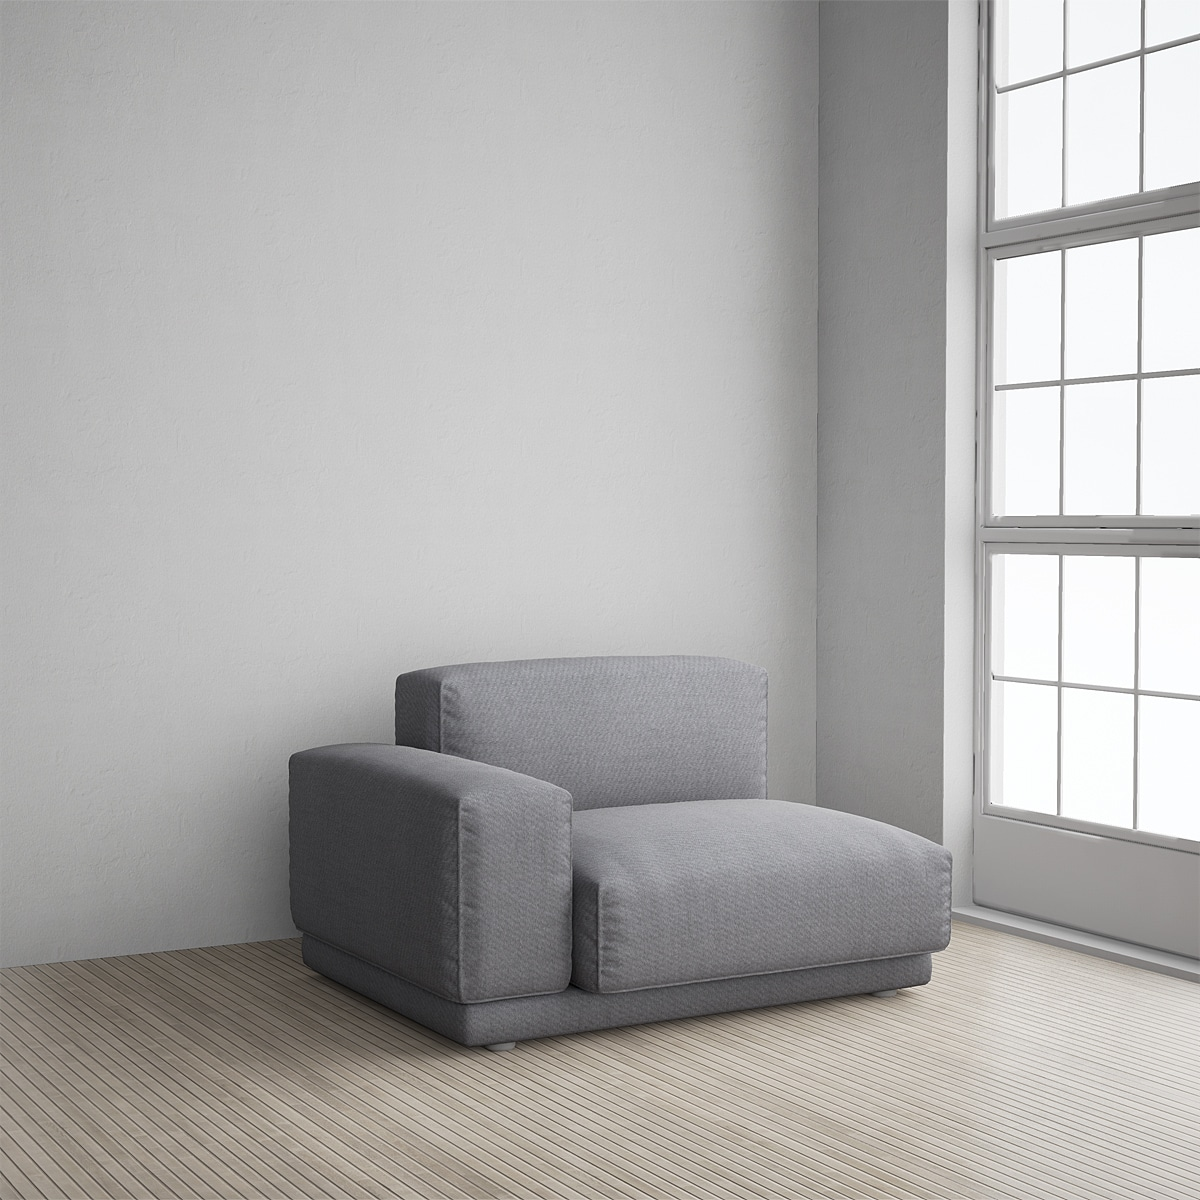 vitra sofa modular 3 seater black fabric bed collage module 03 ue4arch